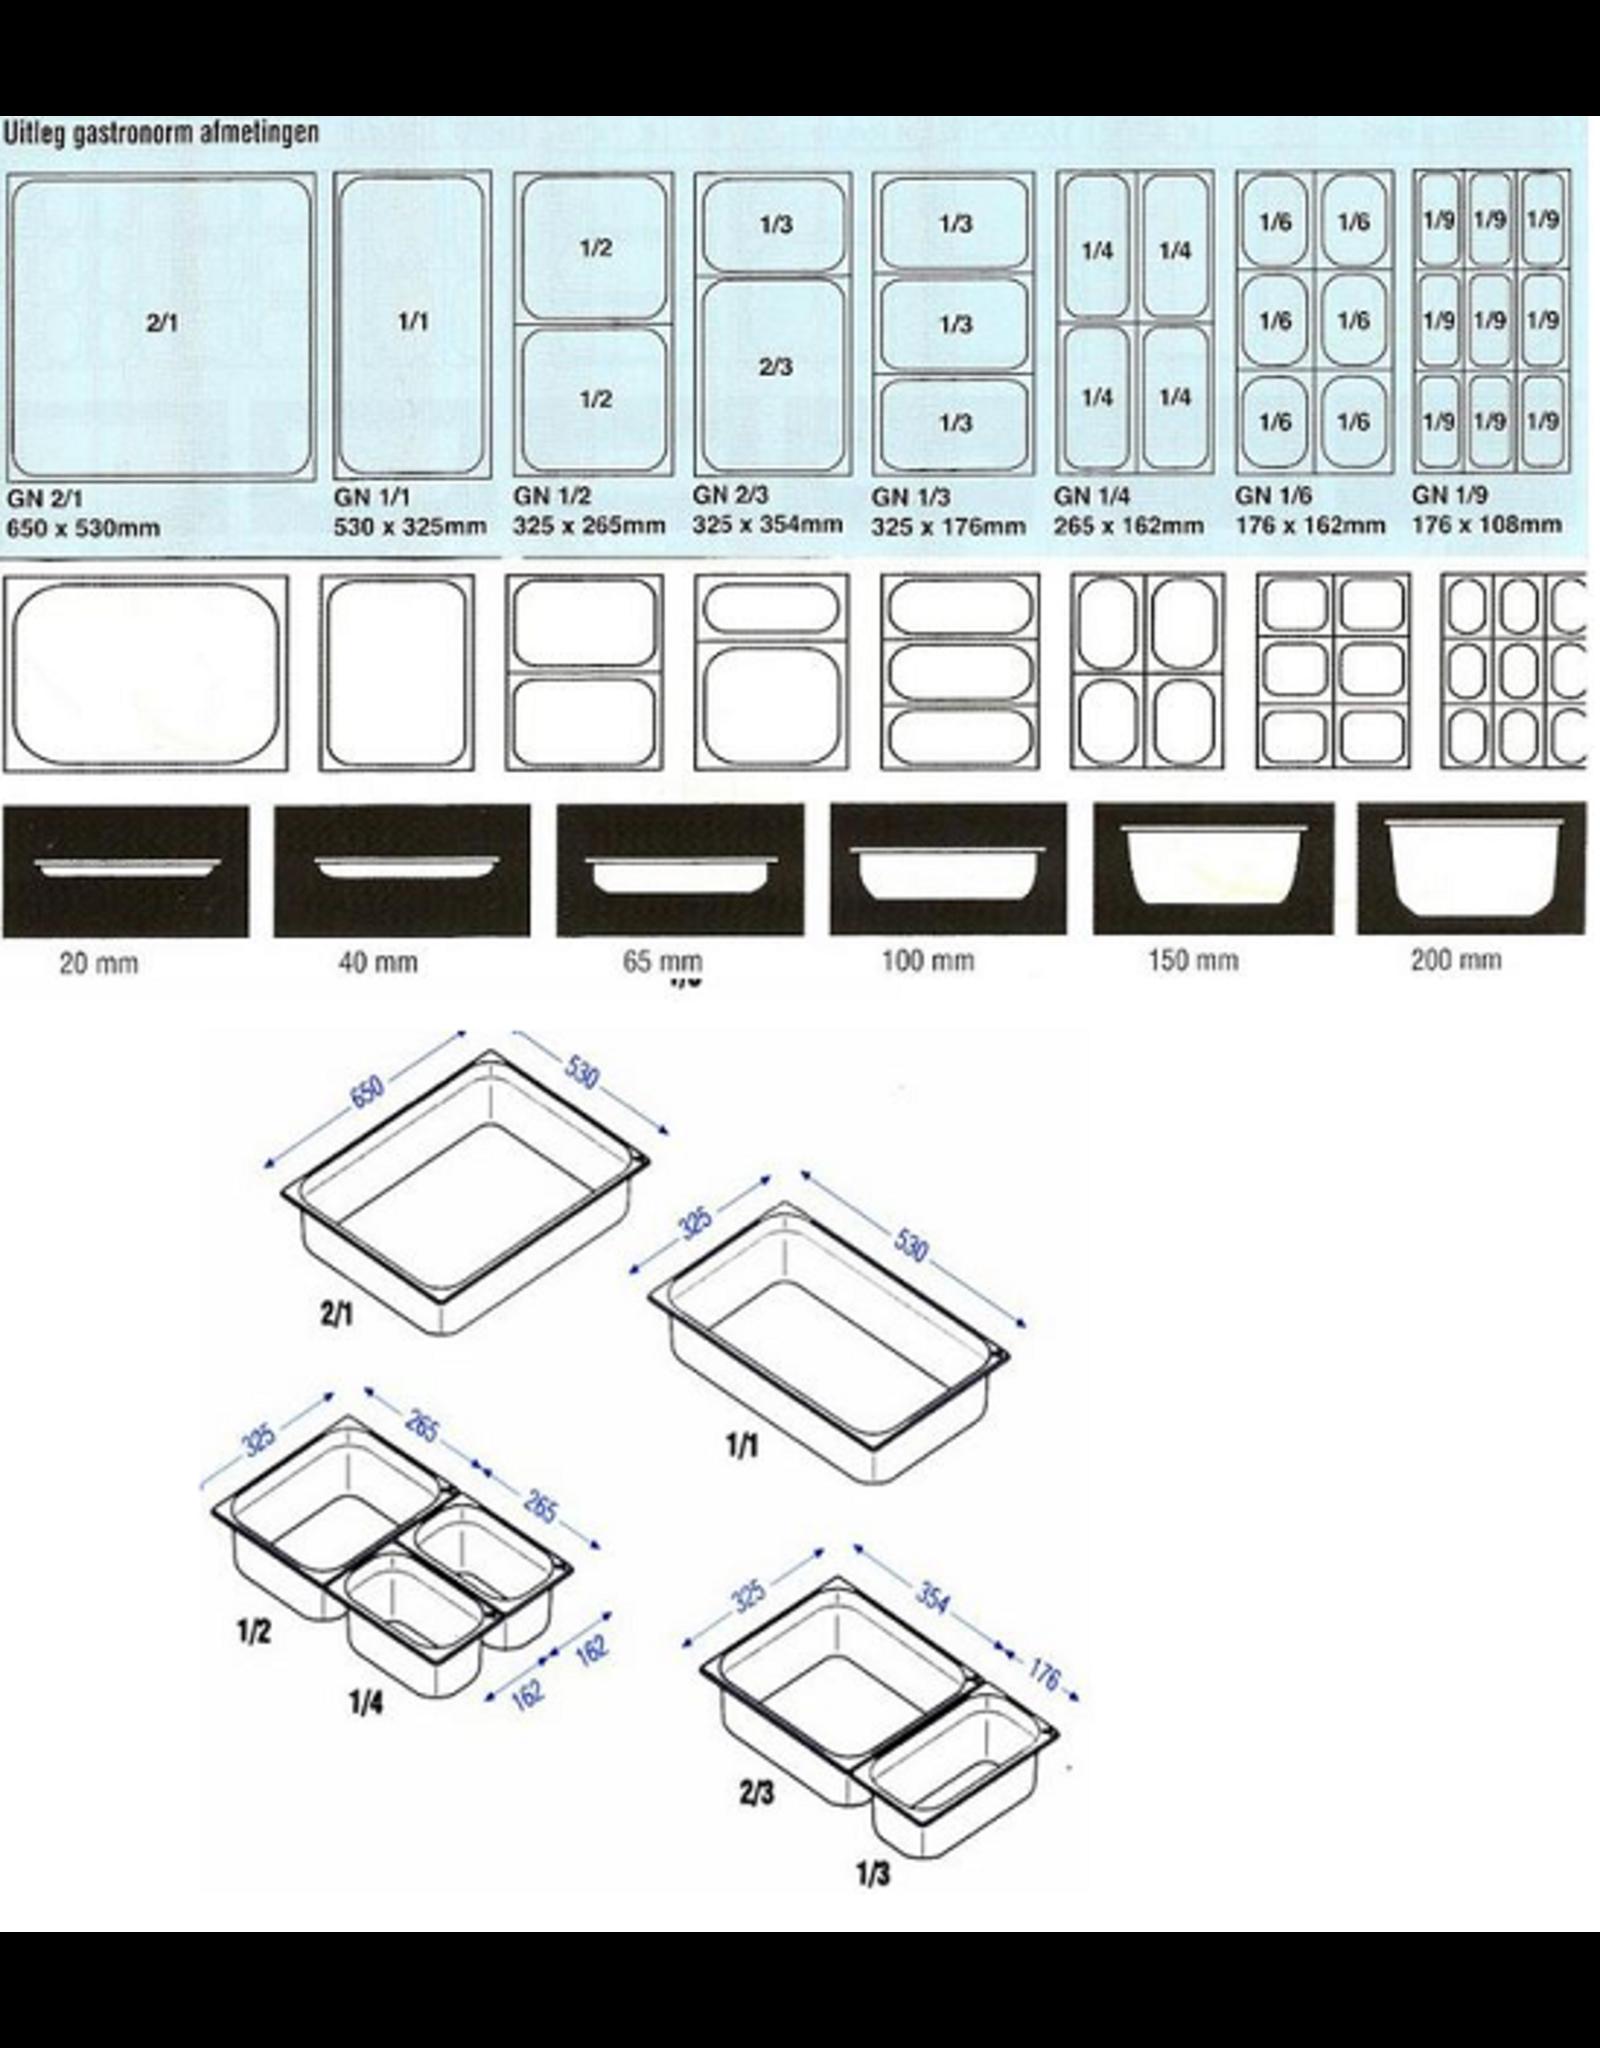 Q-Gastro Gastronorm Bak RVS 1/6 GN | 150mm | 176x162mm